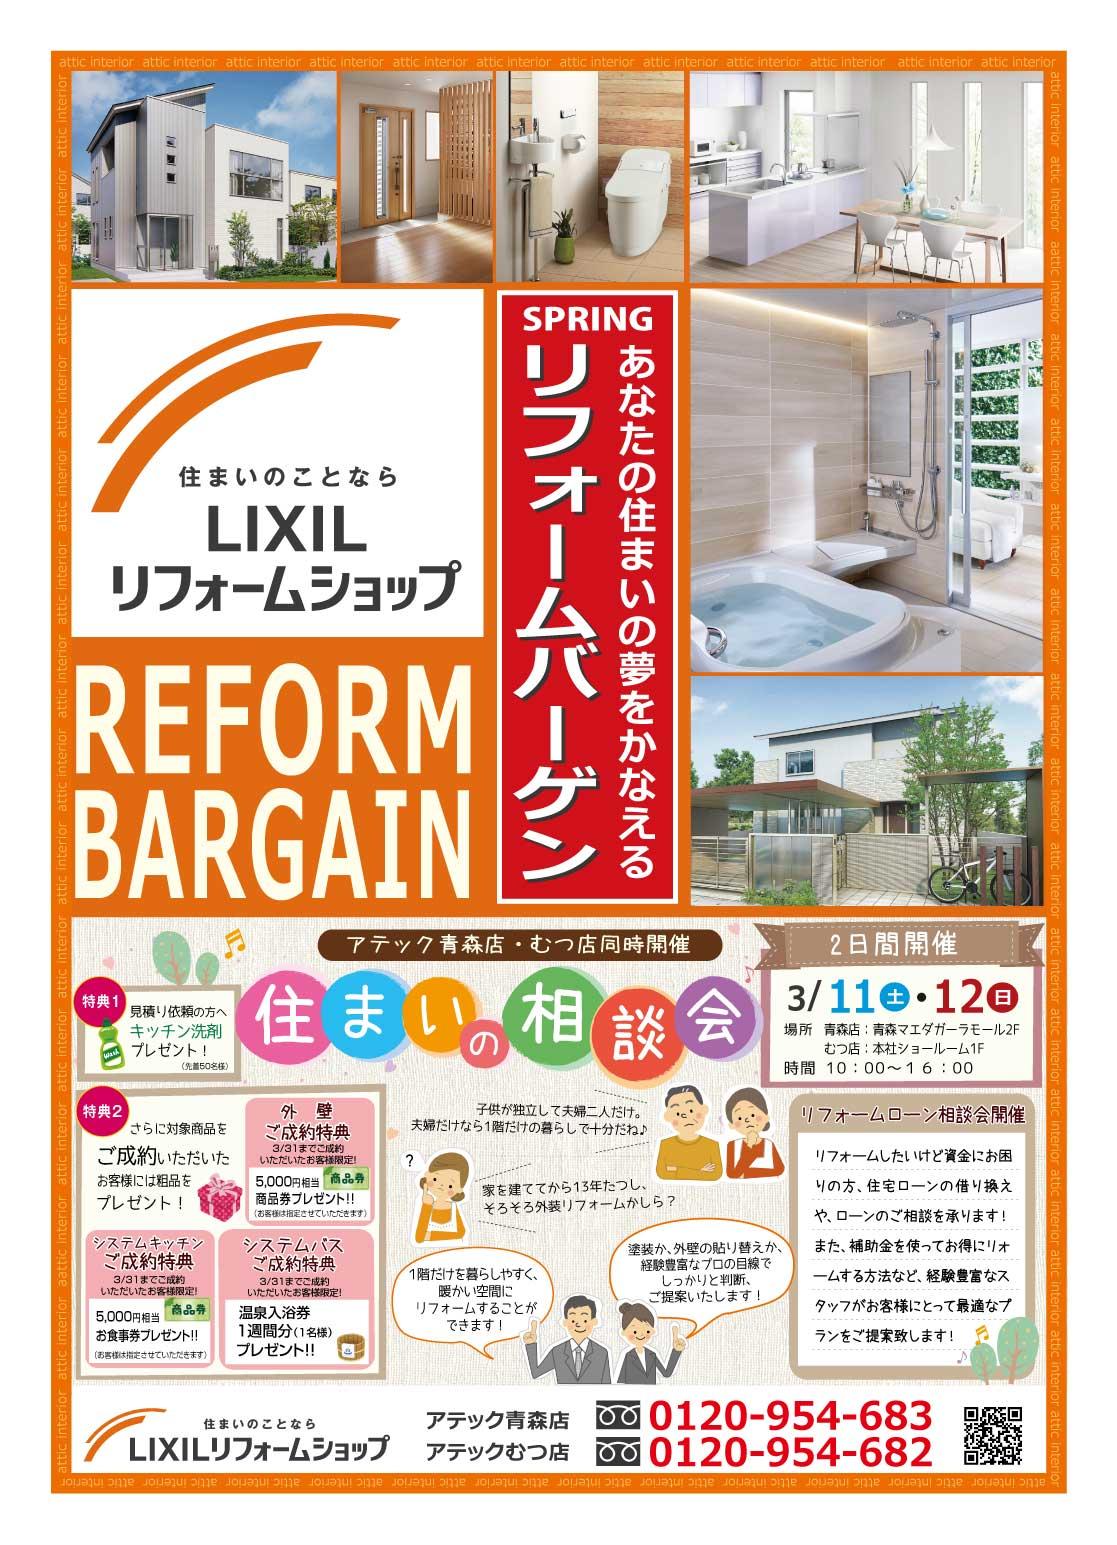 https://lixil-reformshop.jp/shop/SC00021006/0310chirashi_B3_omote.jpg